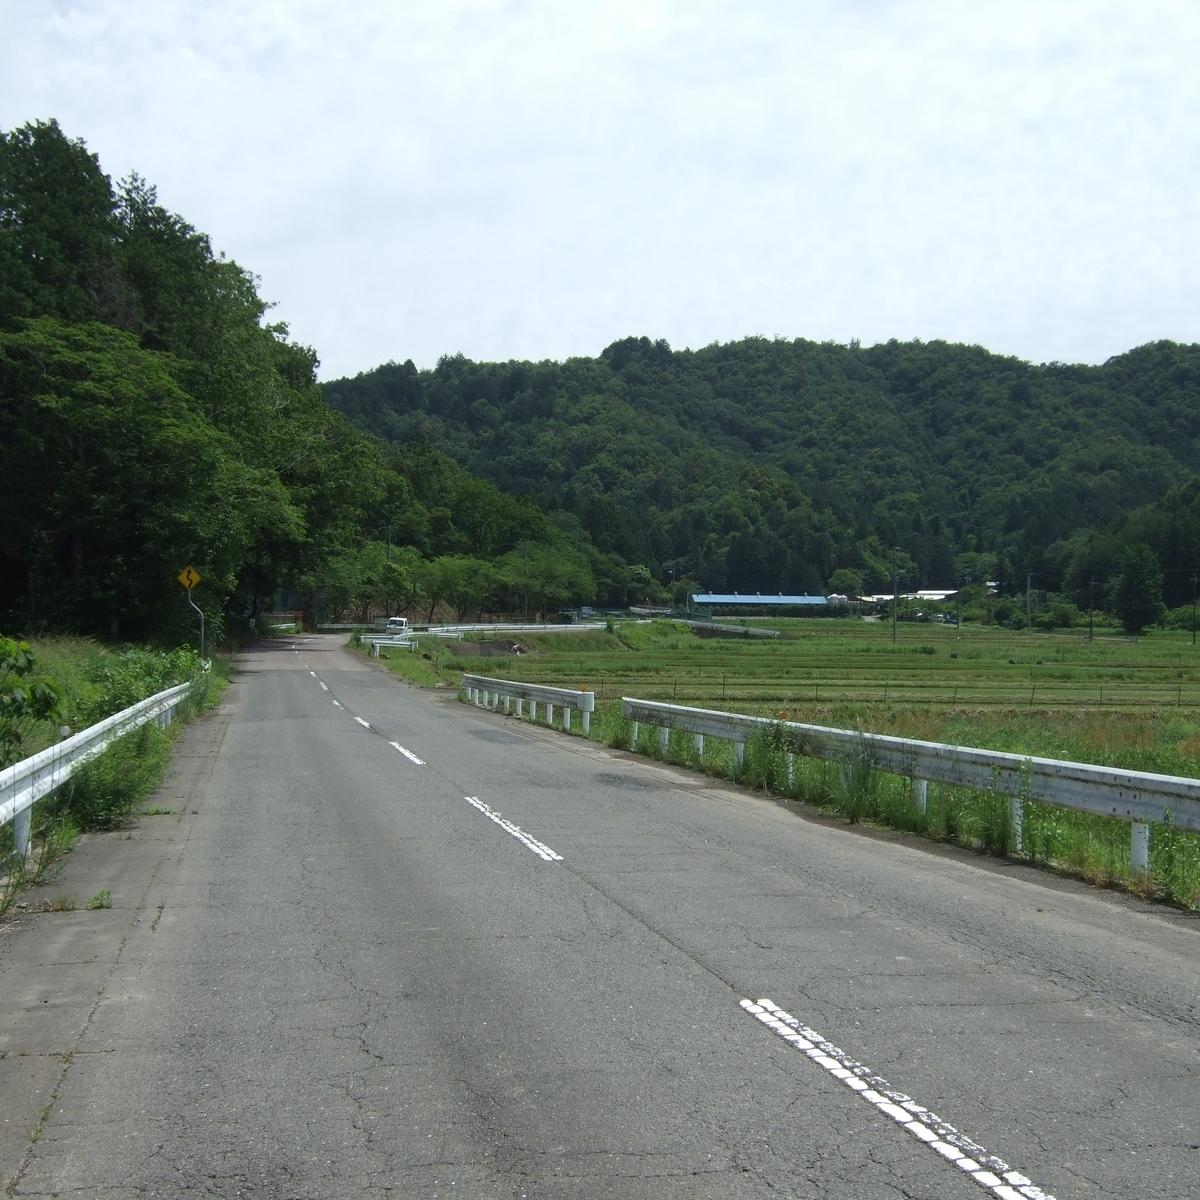 f:id:yoshijiji:20210529165211j:plain